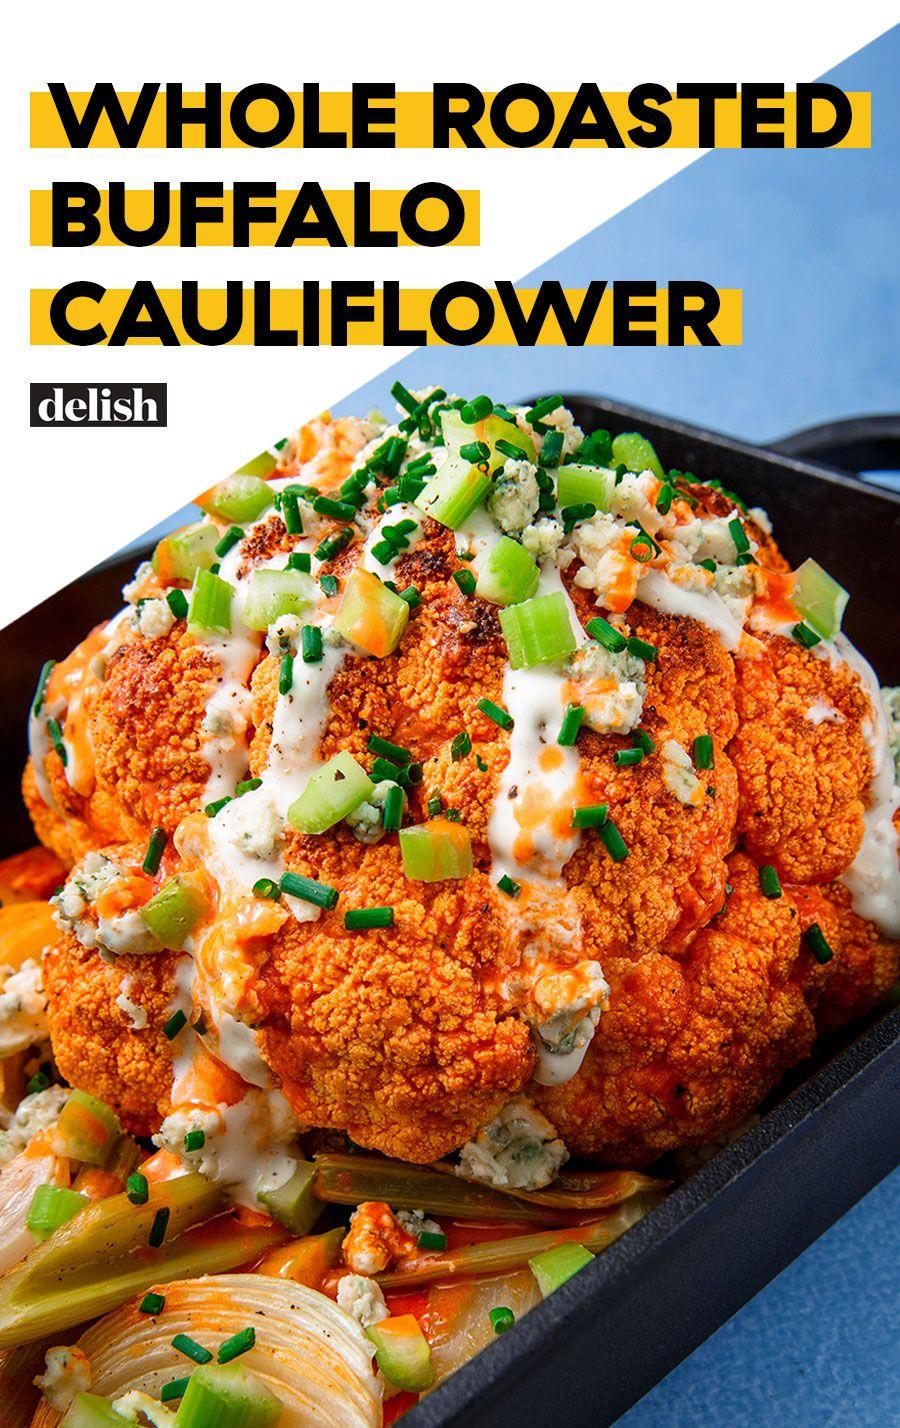 Whole Roasted Buffalo Cauliflower